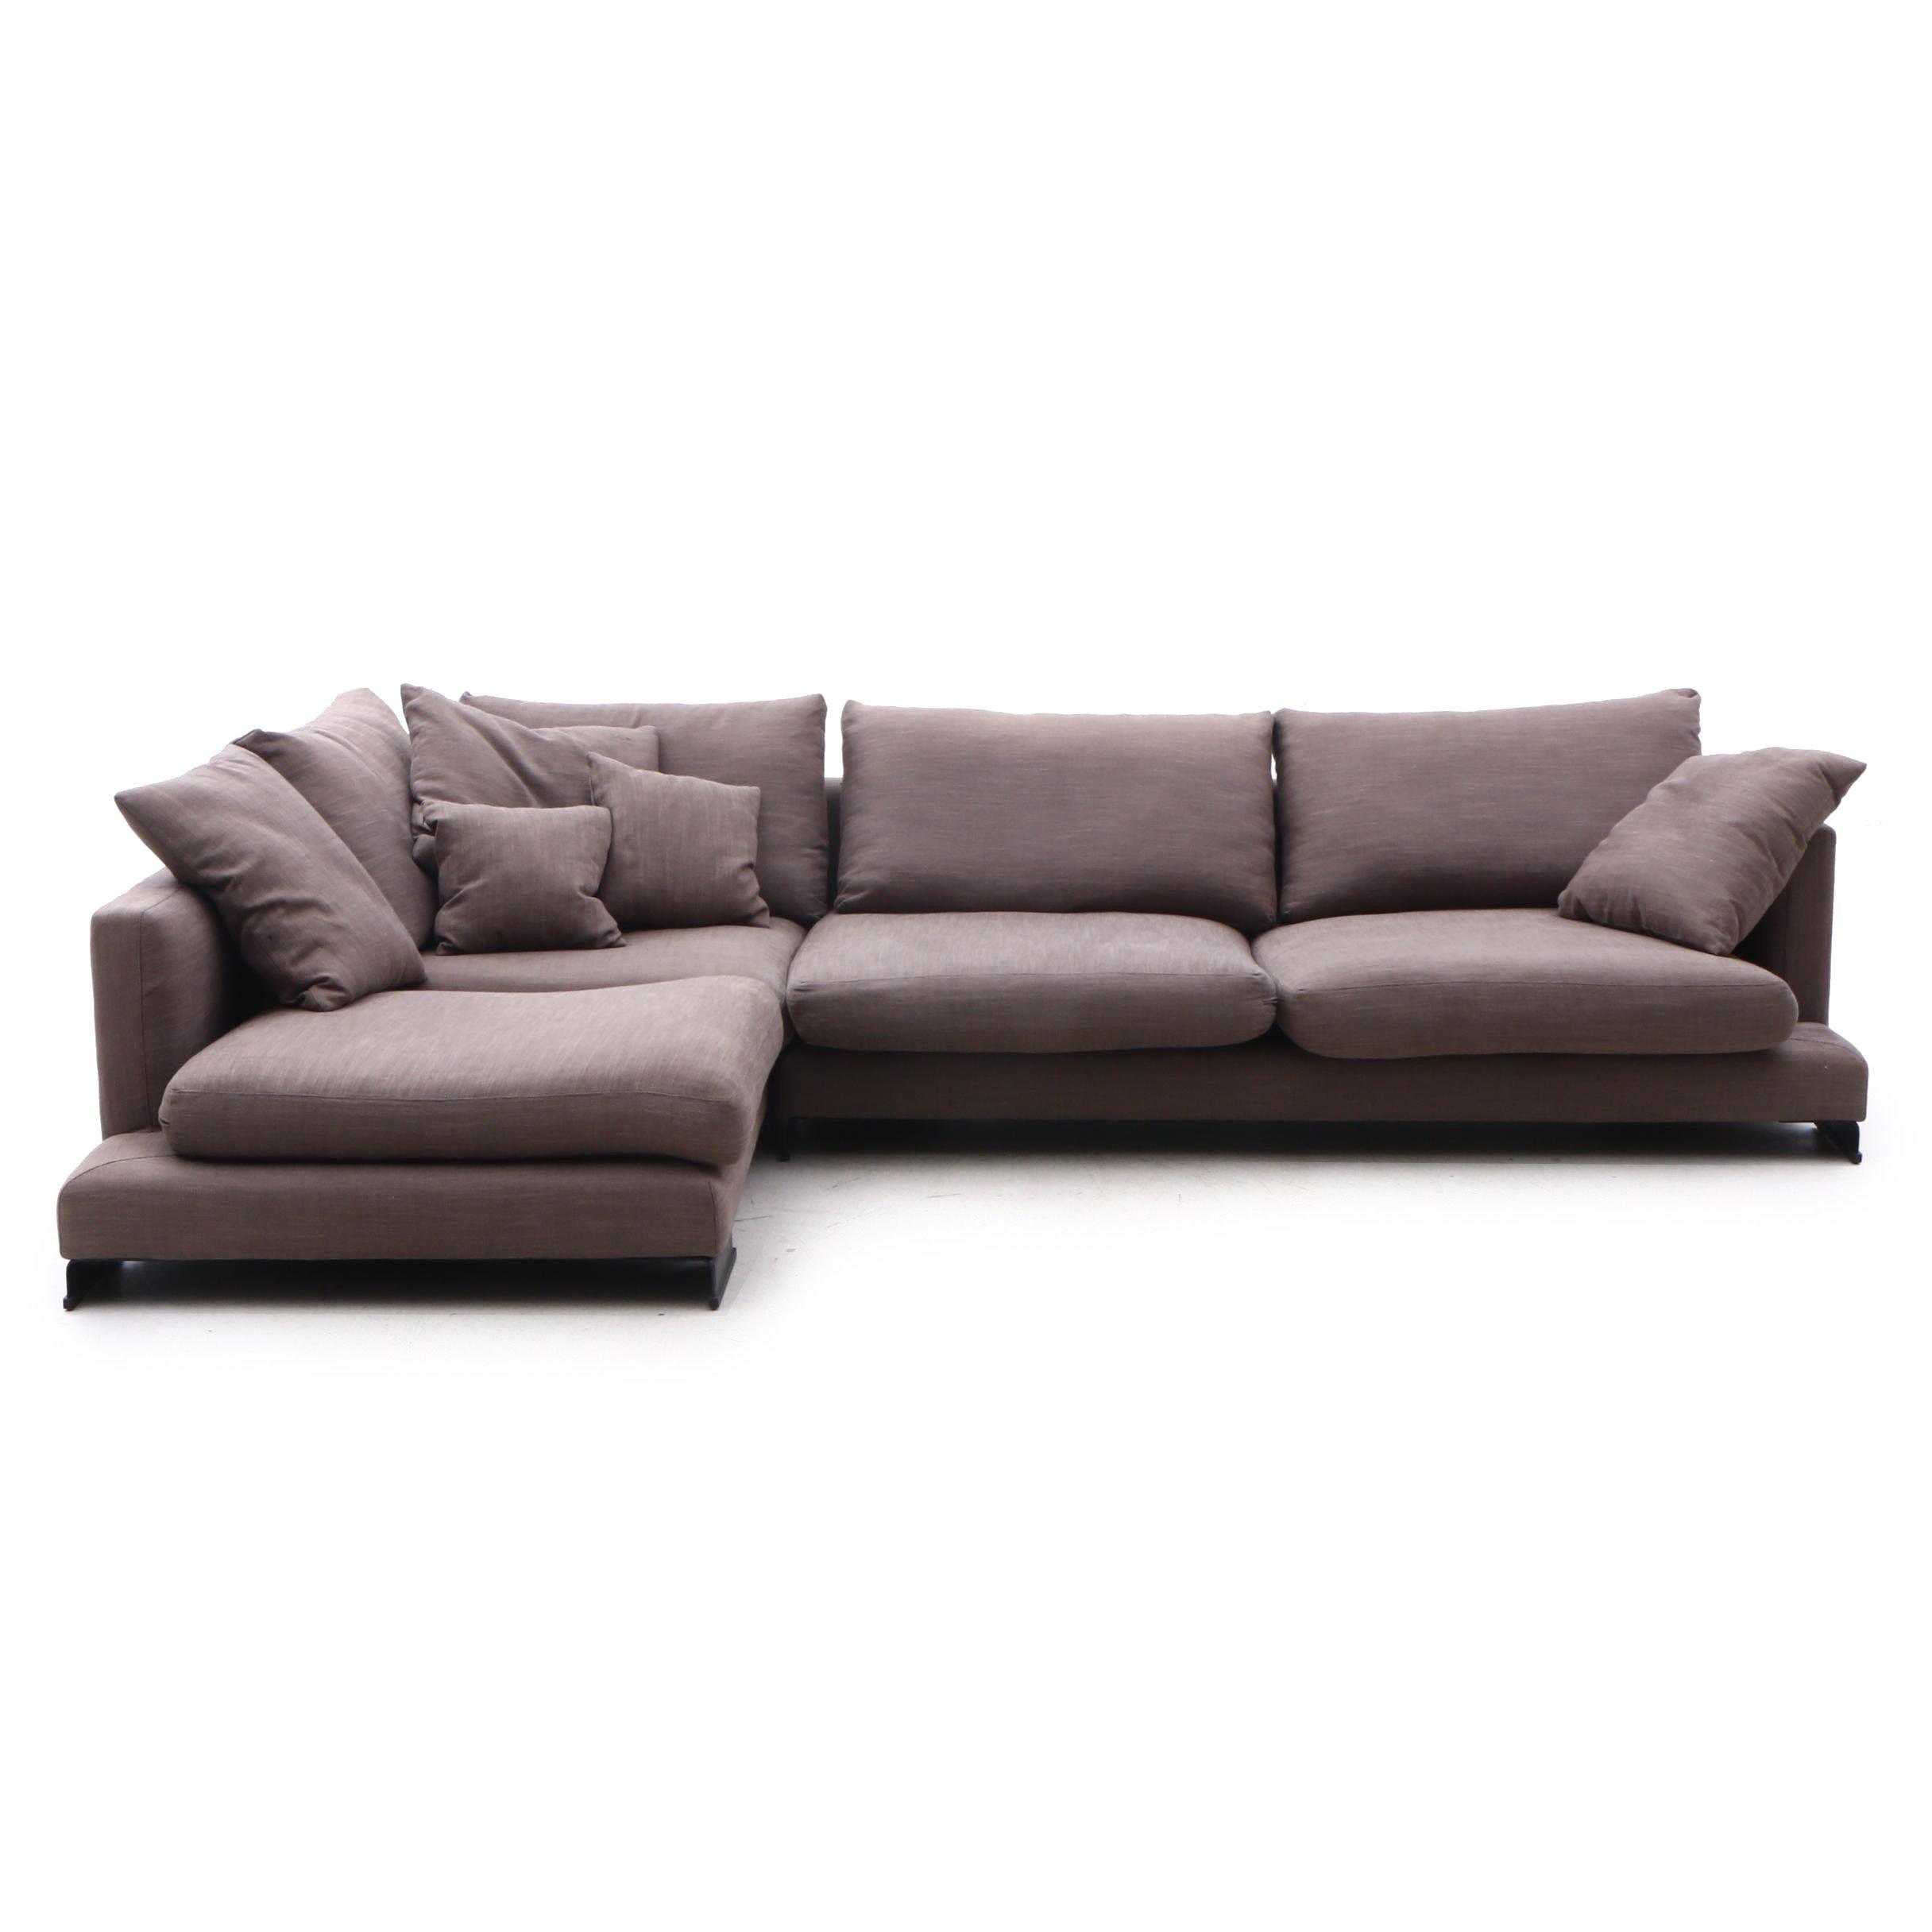 Modernist Sectional Sofa, Contemporary